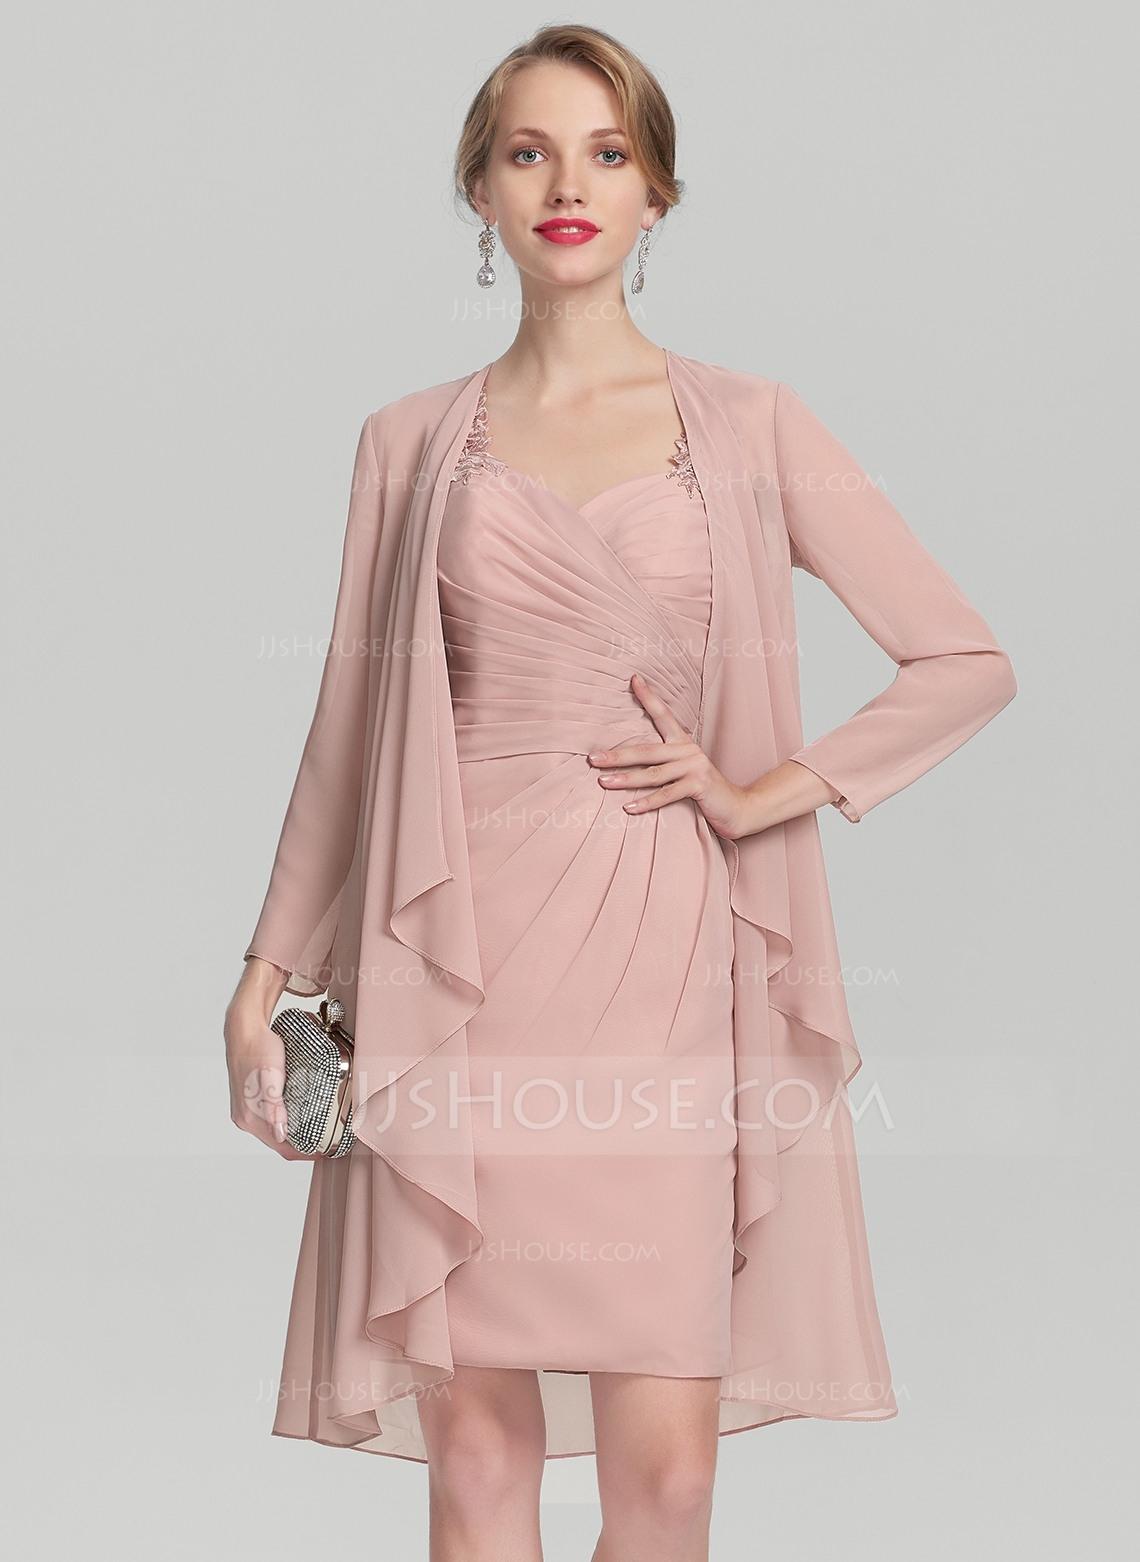 Formal Großartig Kleid Altrosa Knielang Galerie Fantastisch Kleid Altrosa Knielang Vertrieb